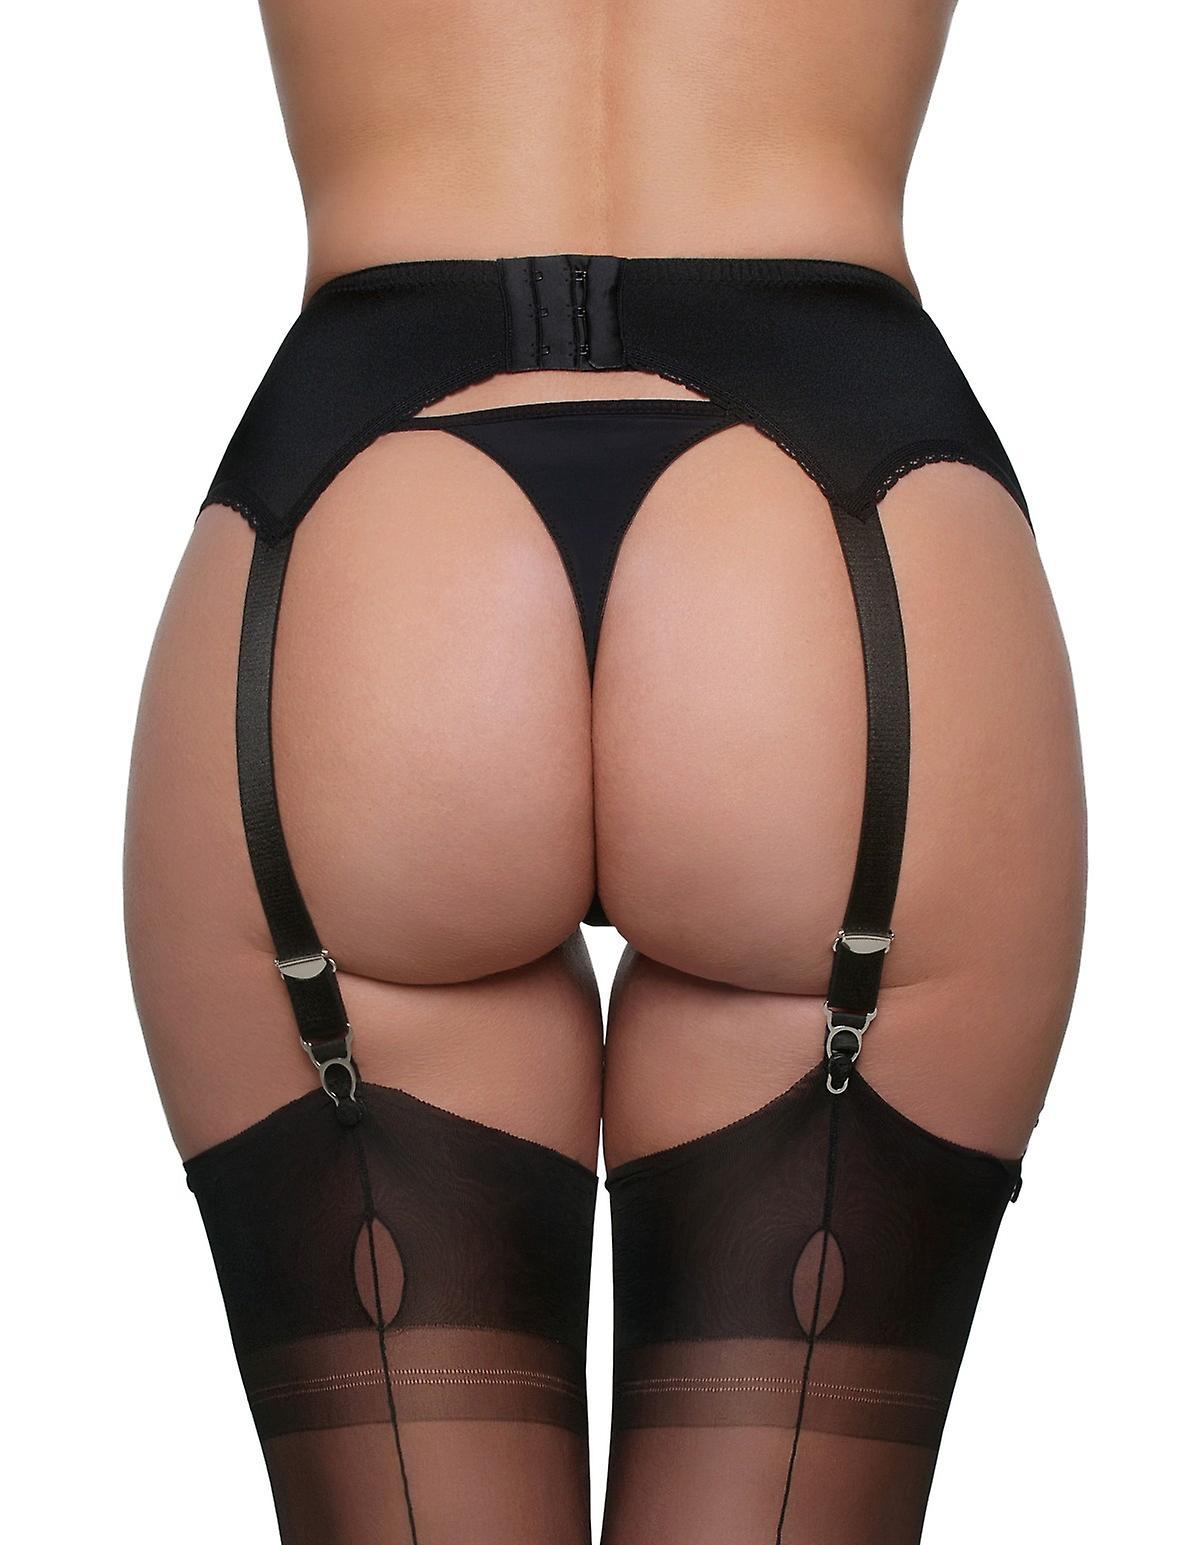 cdf6ea462 Nylon Dreams NDL8 Women s Black Solid Colour Lace Garter Belt 6 Strap  Suspender Belt